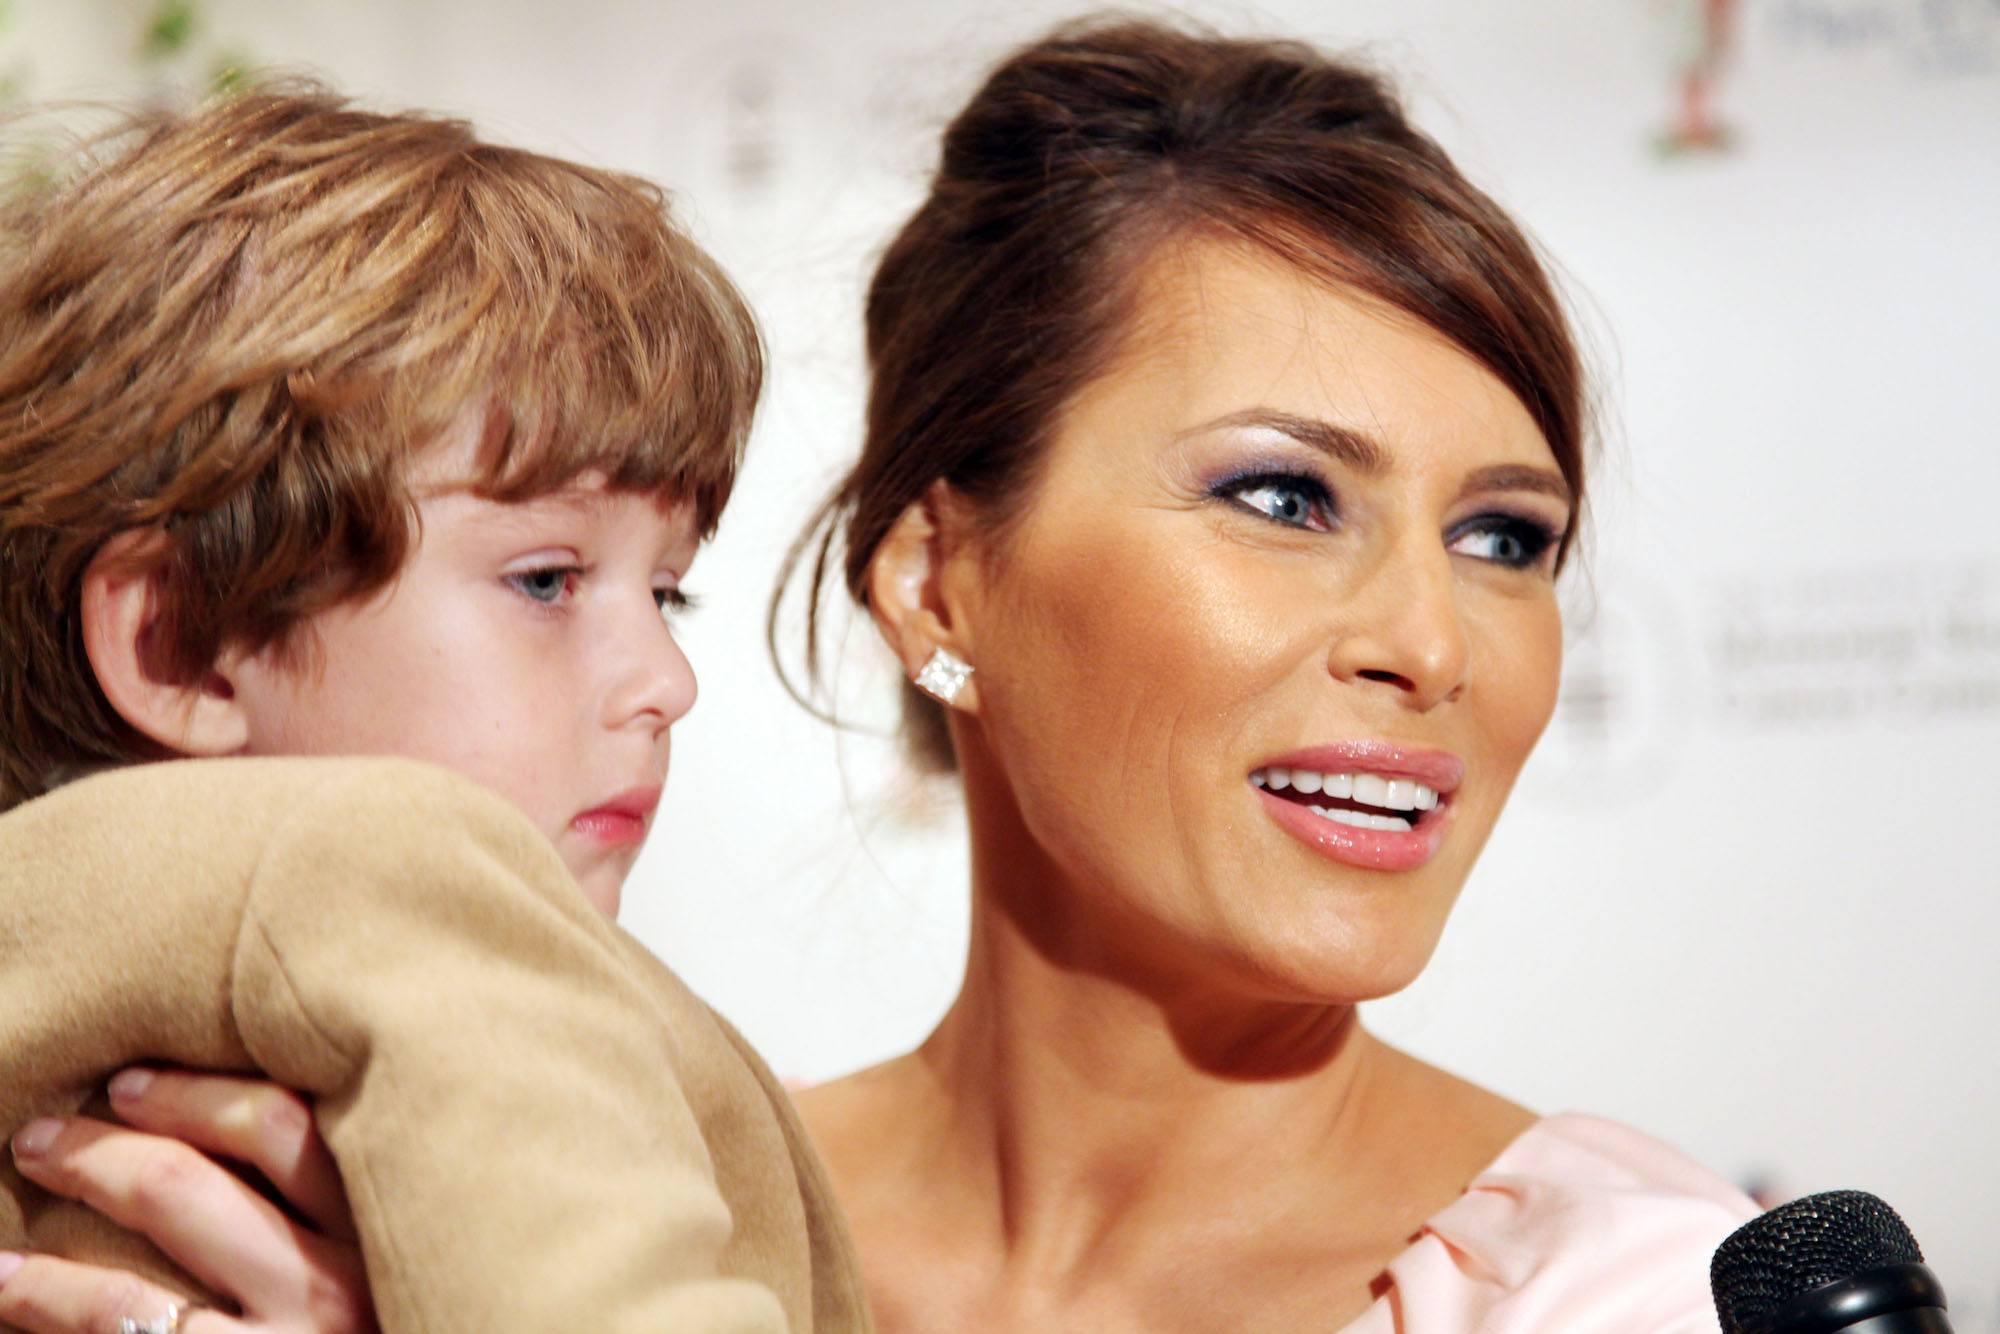 Barron Trump and Melania Trump attend the 18th annual Bunny Hop in 2009